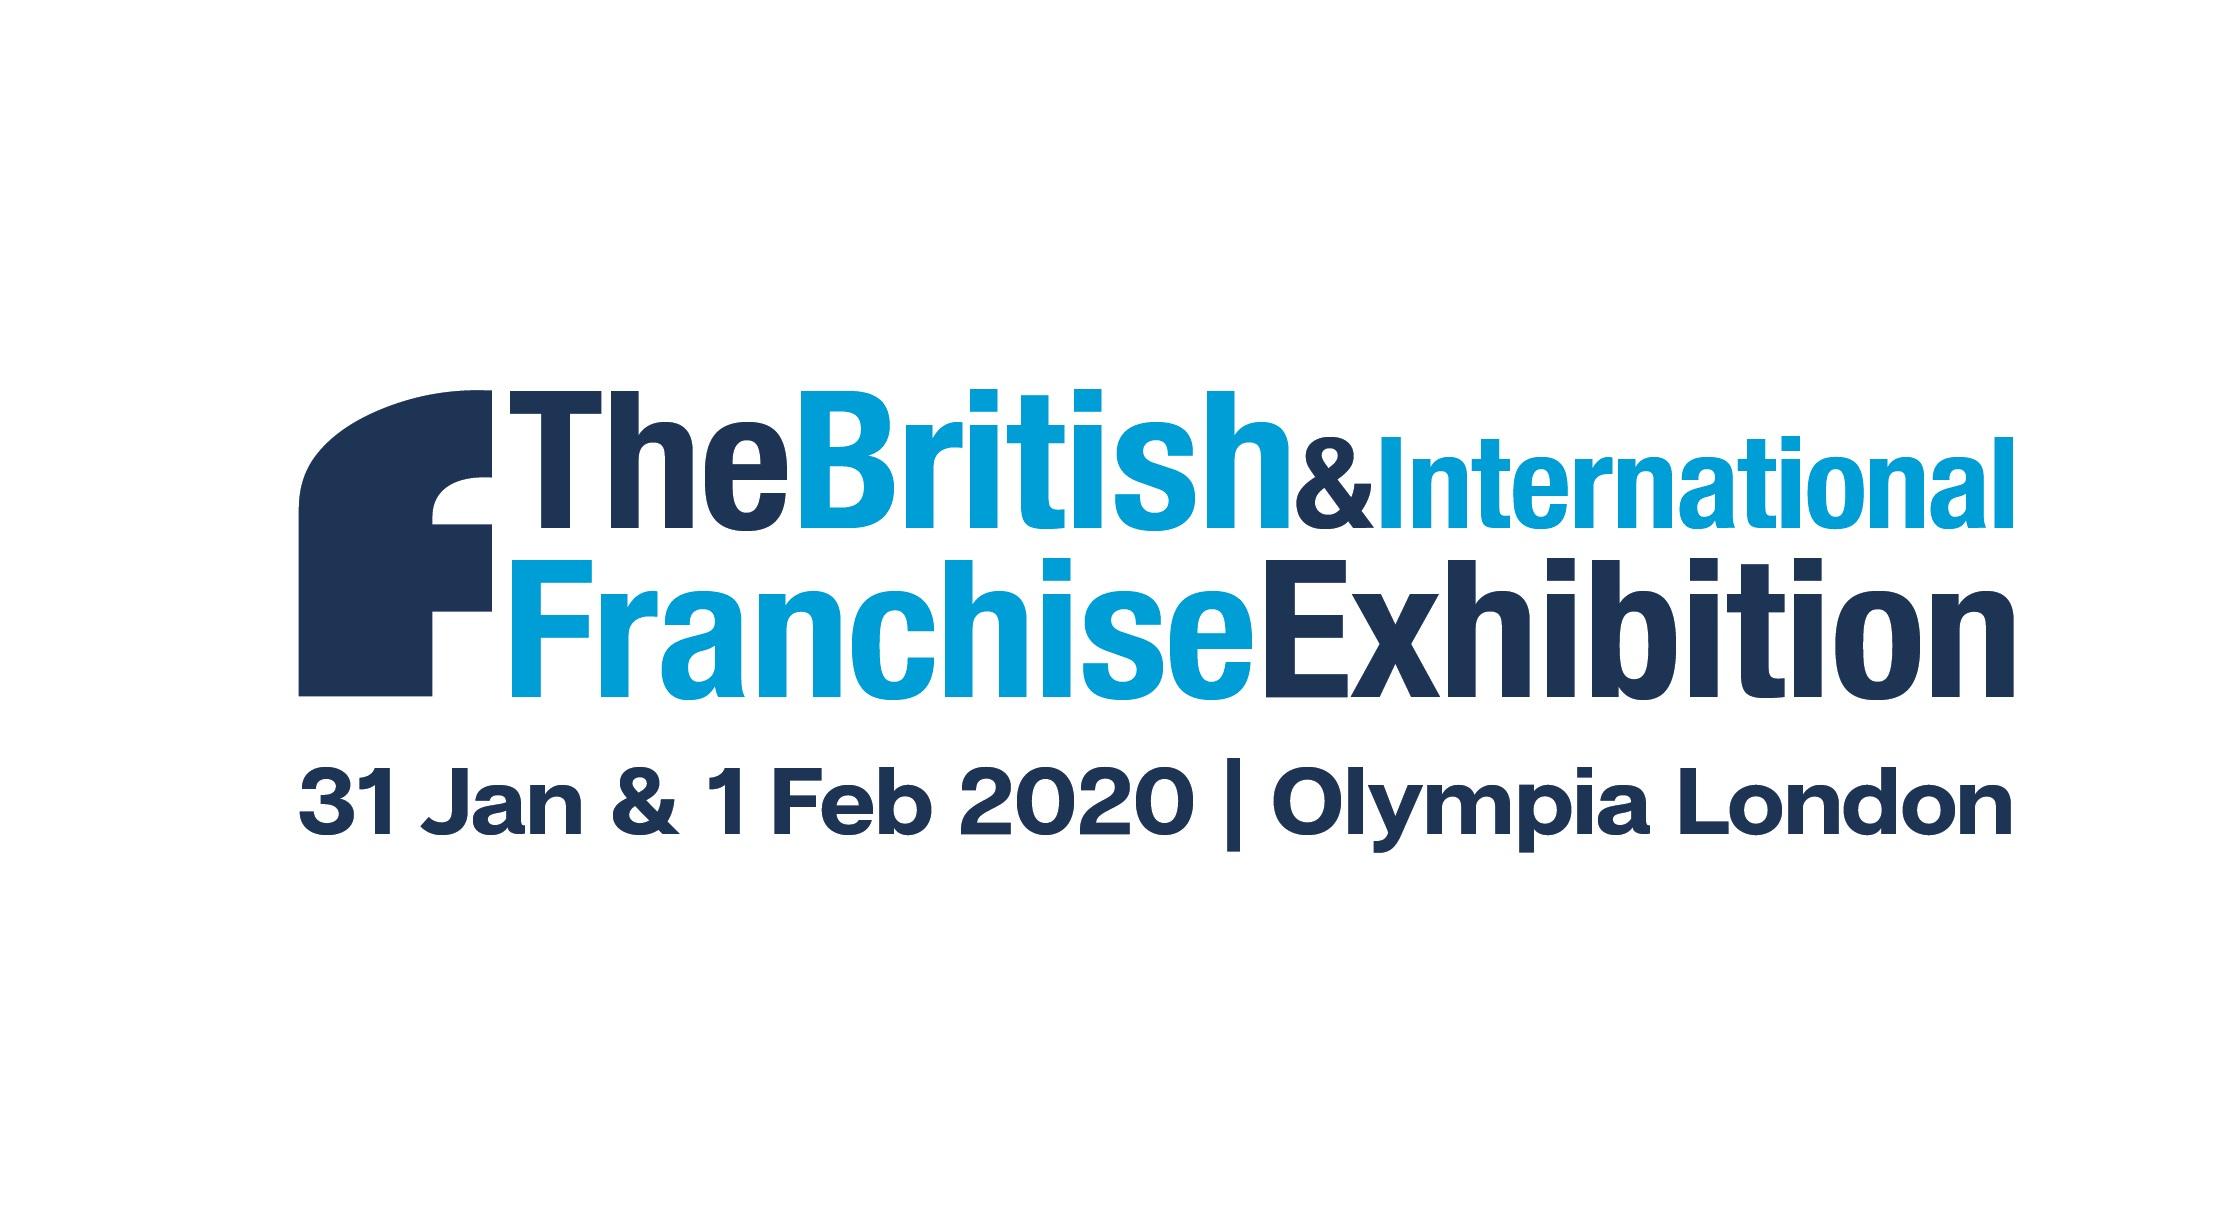 The british & international franchise